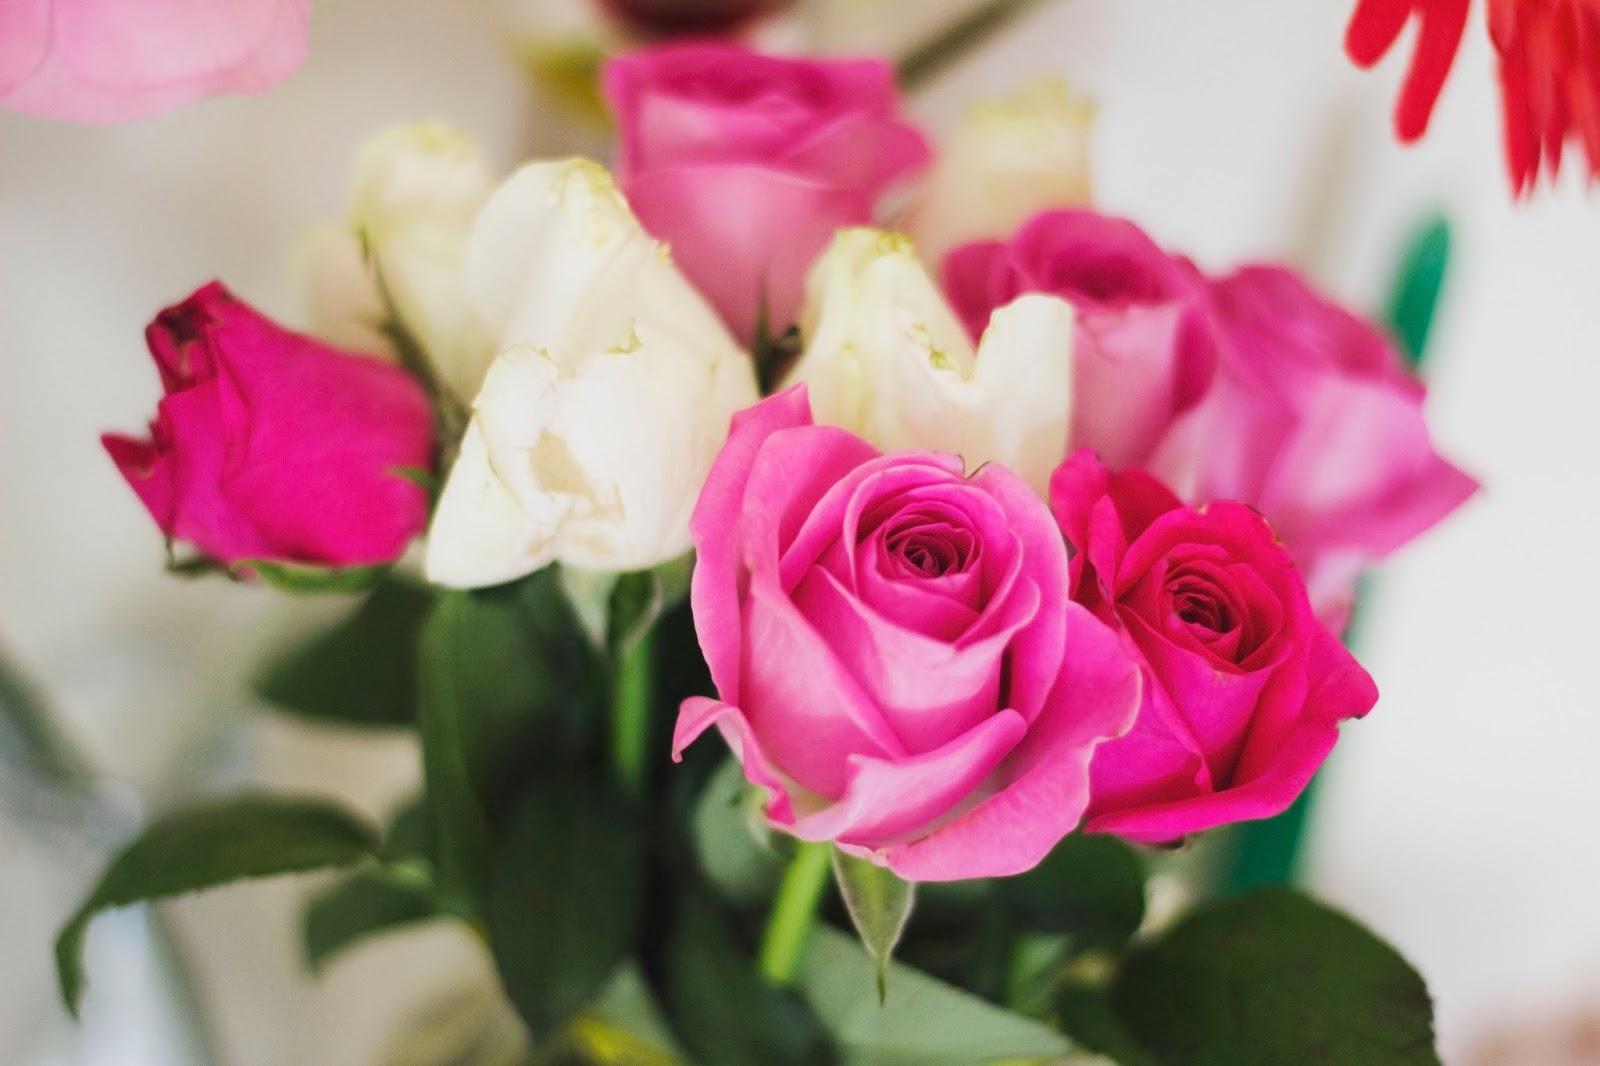 Roses, Beauty bloggers, Gratitude, Flowers, Bloom, Katie Writes, Katie Writes Blog, Derbyshire Blogs, Photography, Pretty,